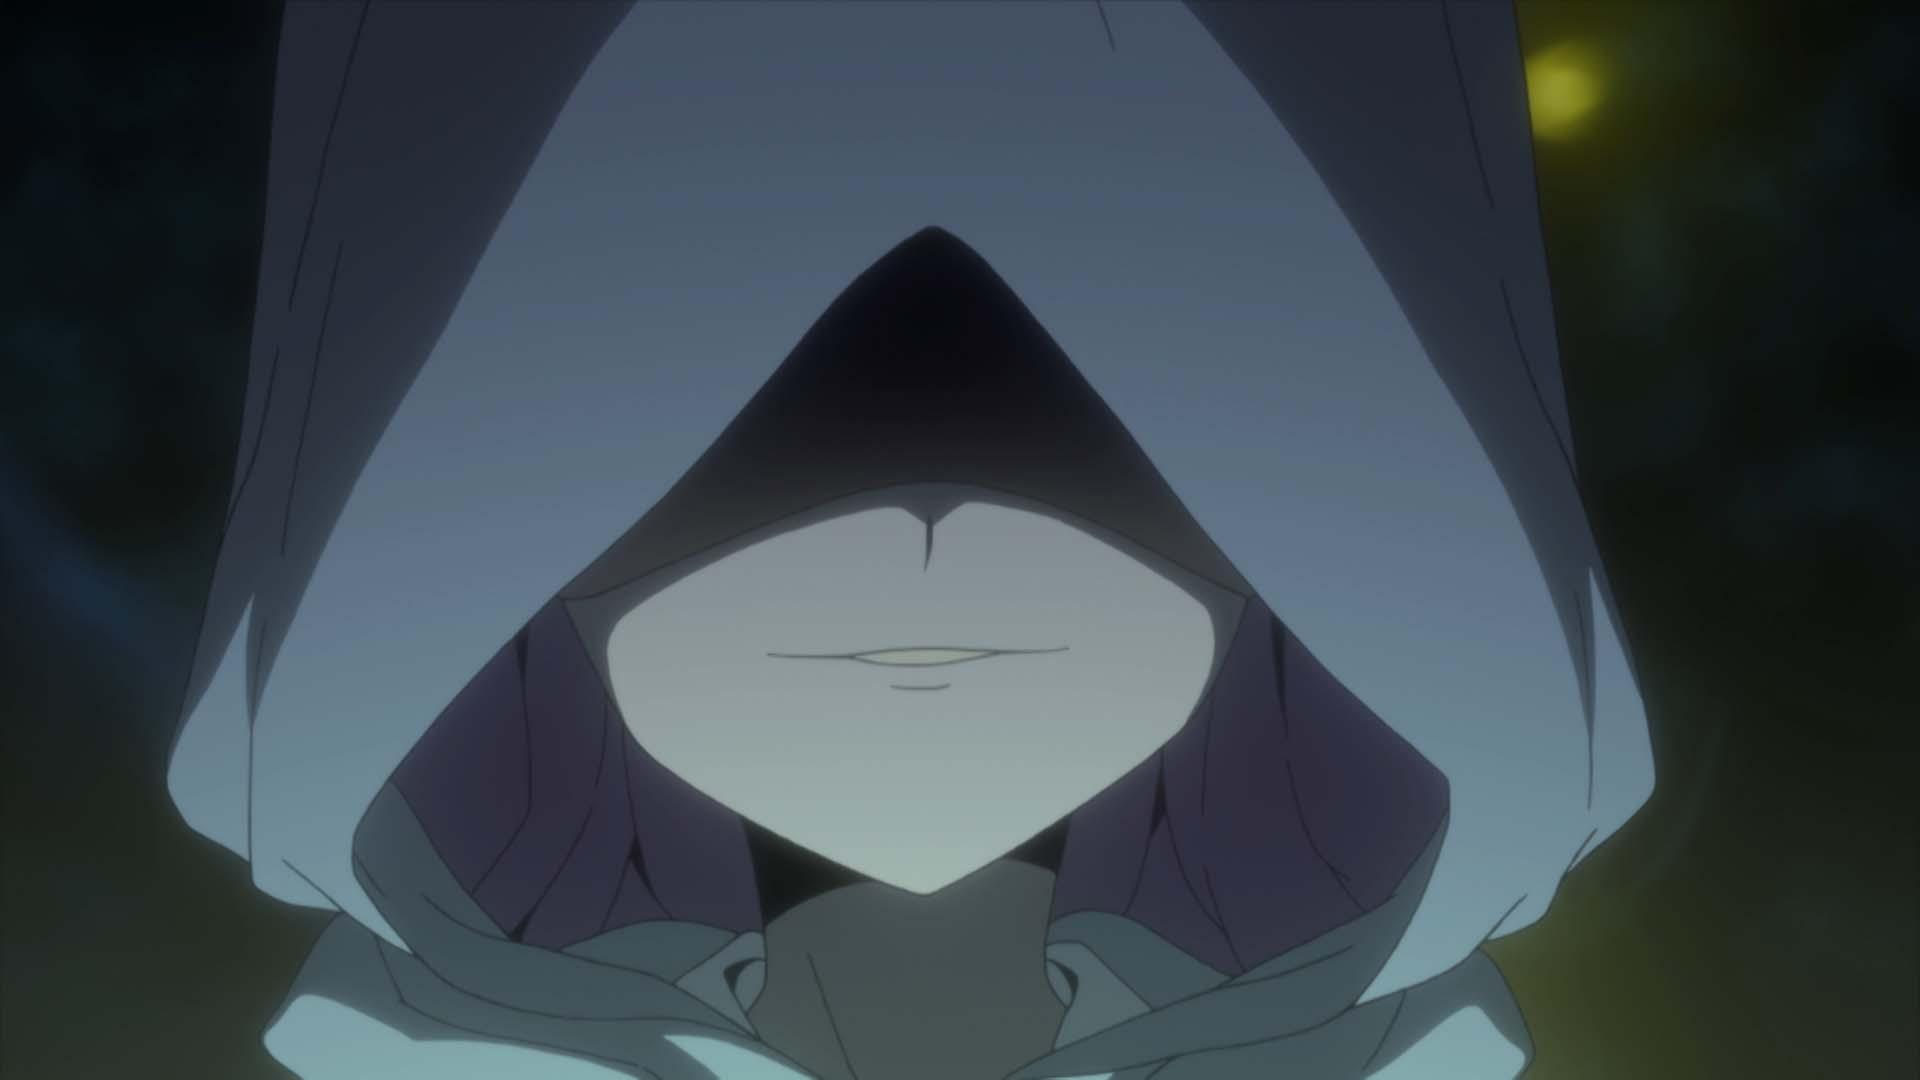 TVアニメ「約束のネバーランド」第2期放送告知CM第2弾